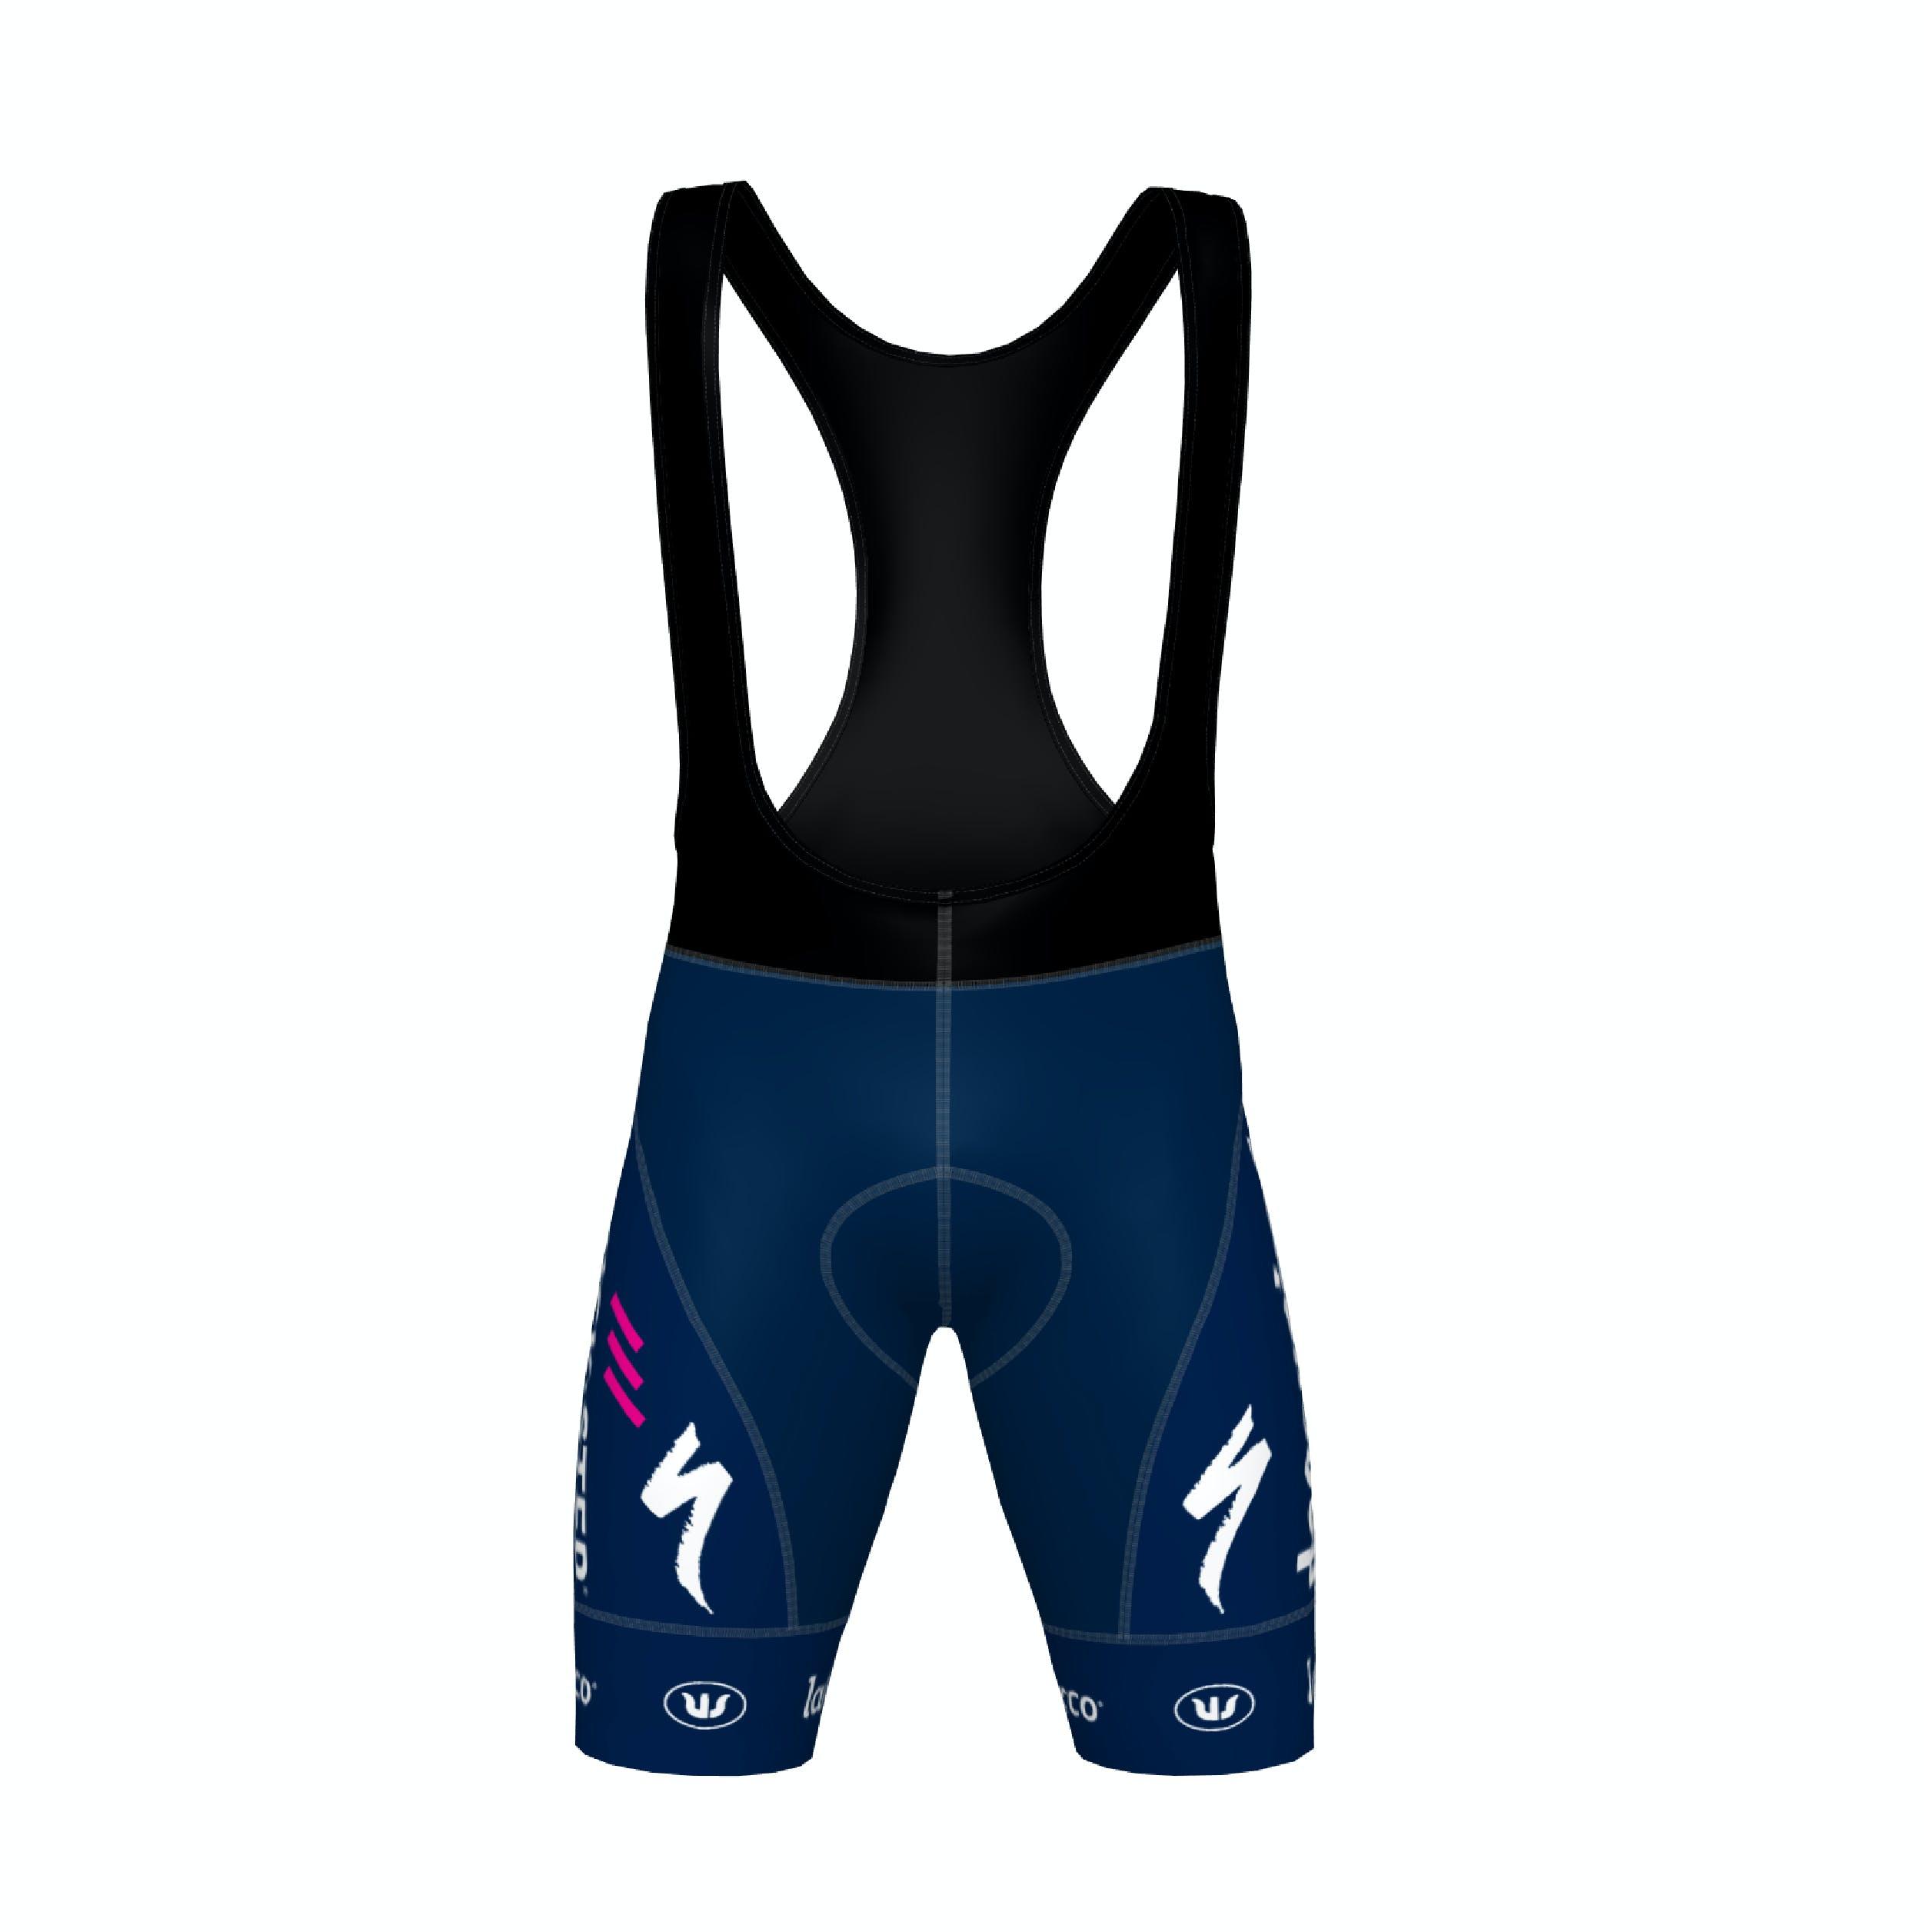 Pre-Sale! Deceuninck Quick-Step 2021 Bib Shorts PR.R + LD Pad